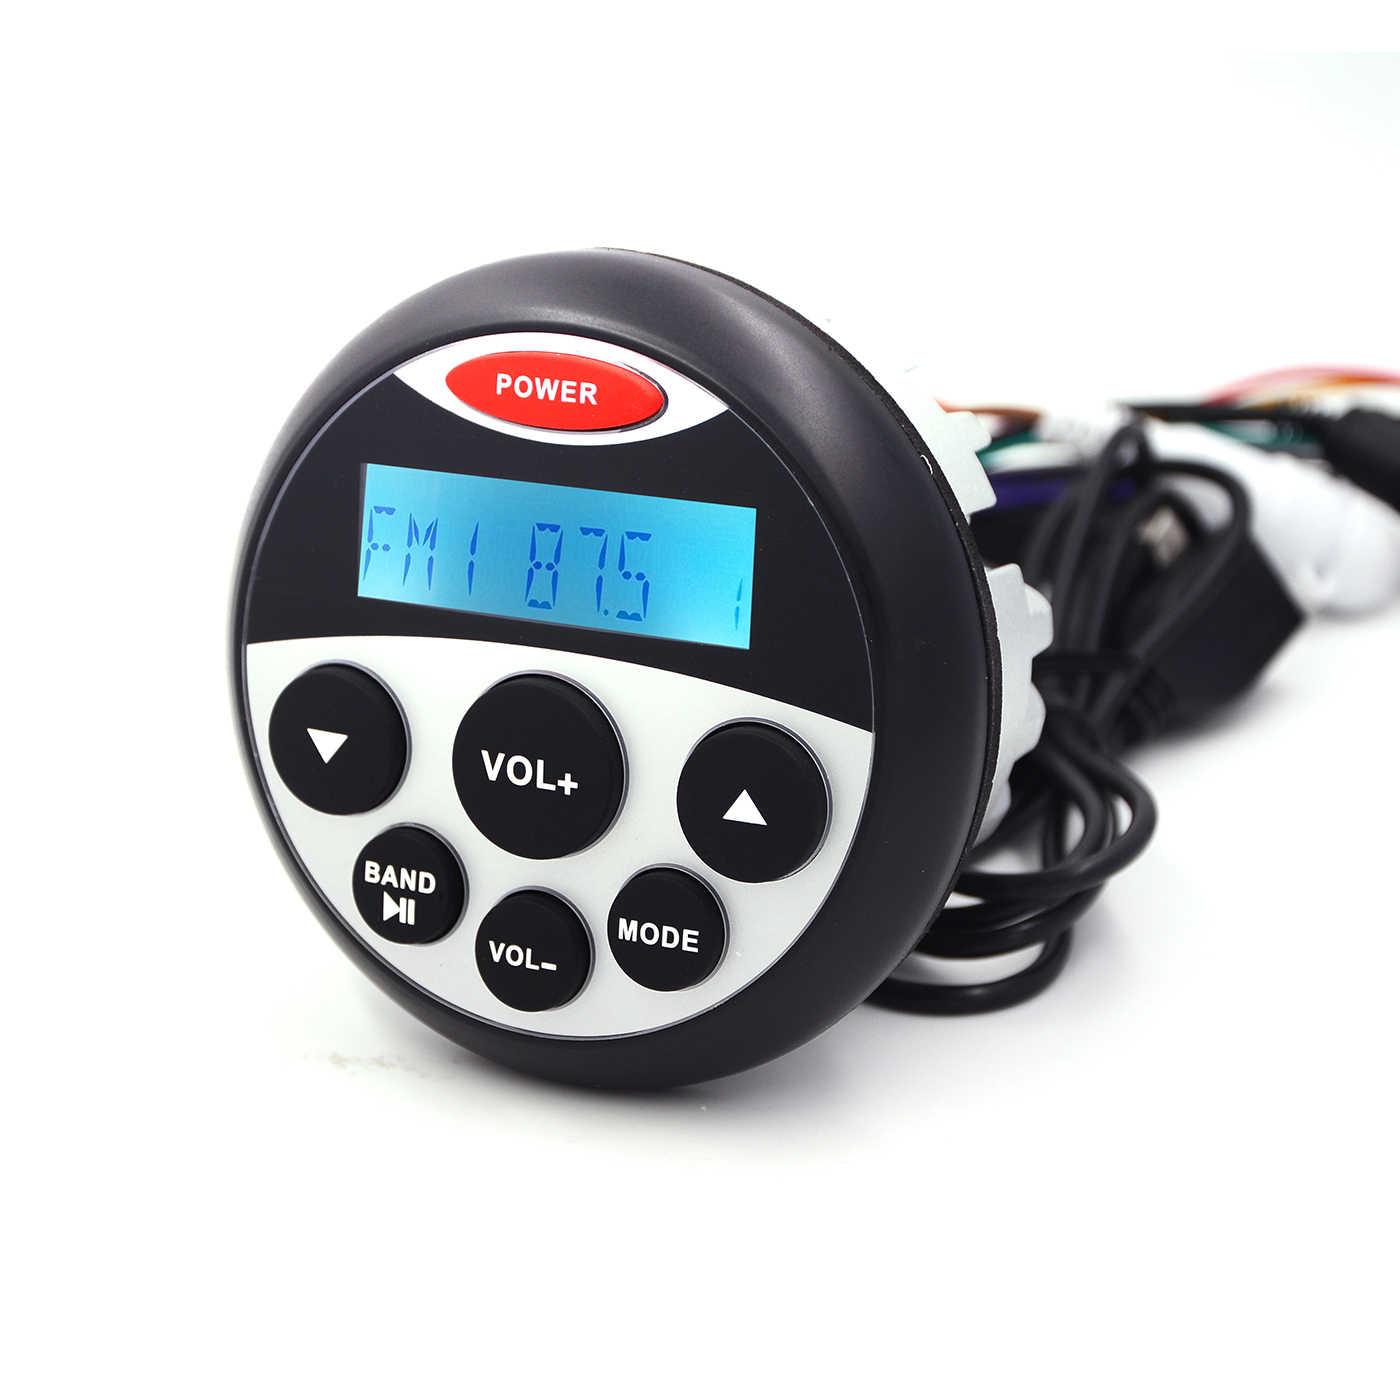 Guzare マリン防水 Bluetooth ステレオラジオオーディオの FM 、 AM 受信機車 MP3 プレーヤー USB 用オートバイボートスパ UTV